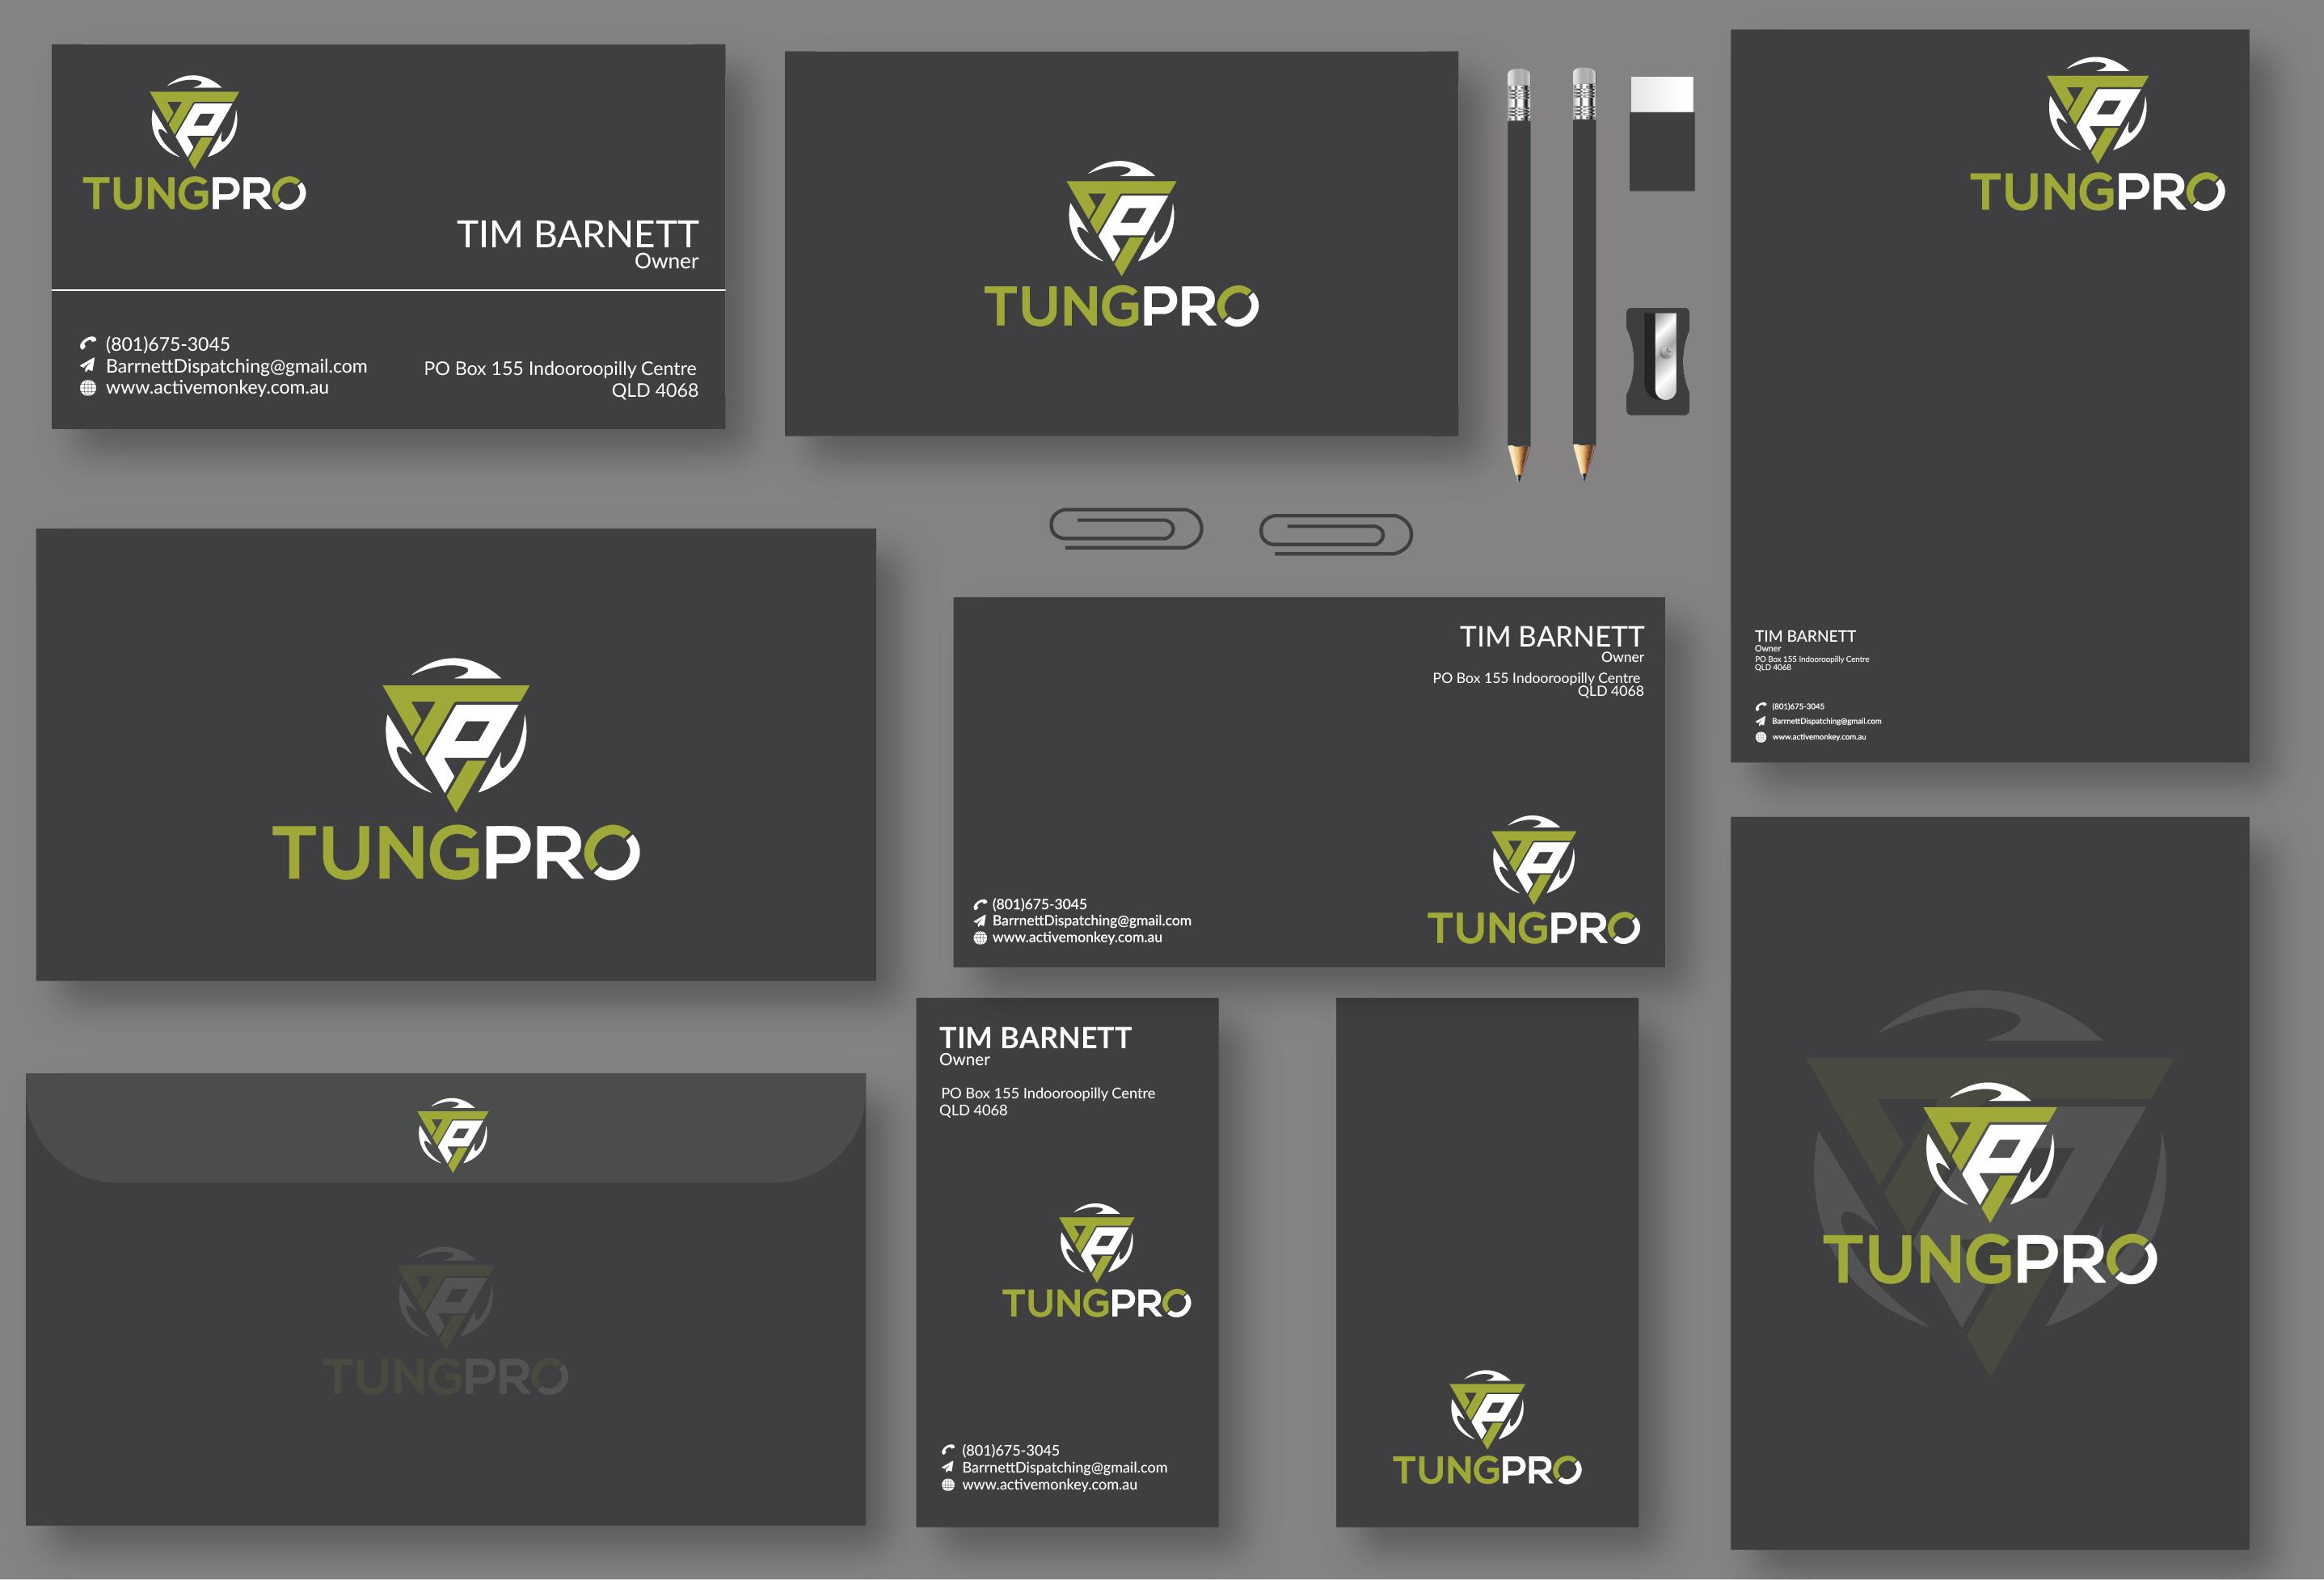 I will design stationery items